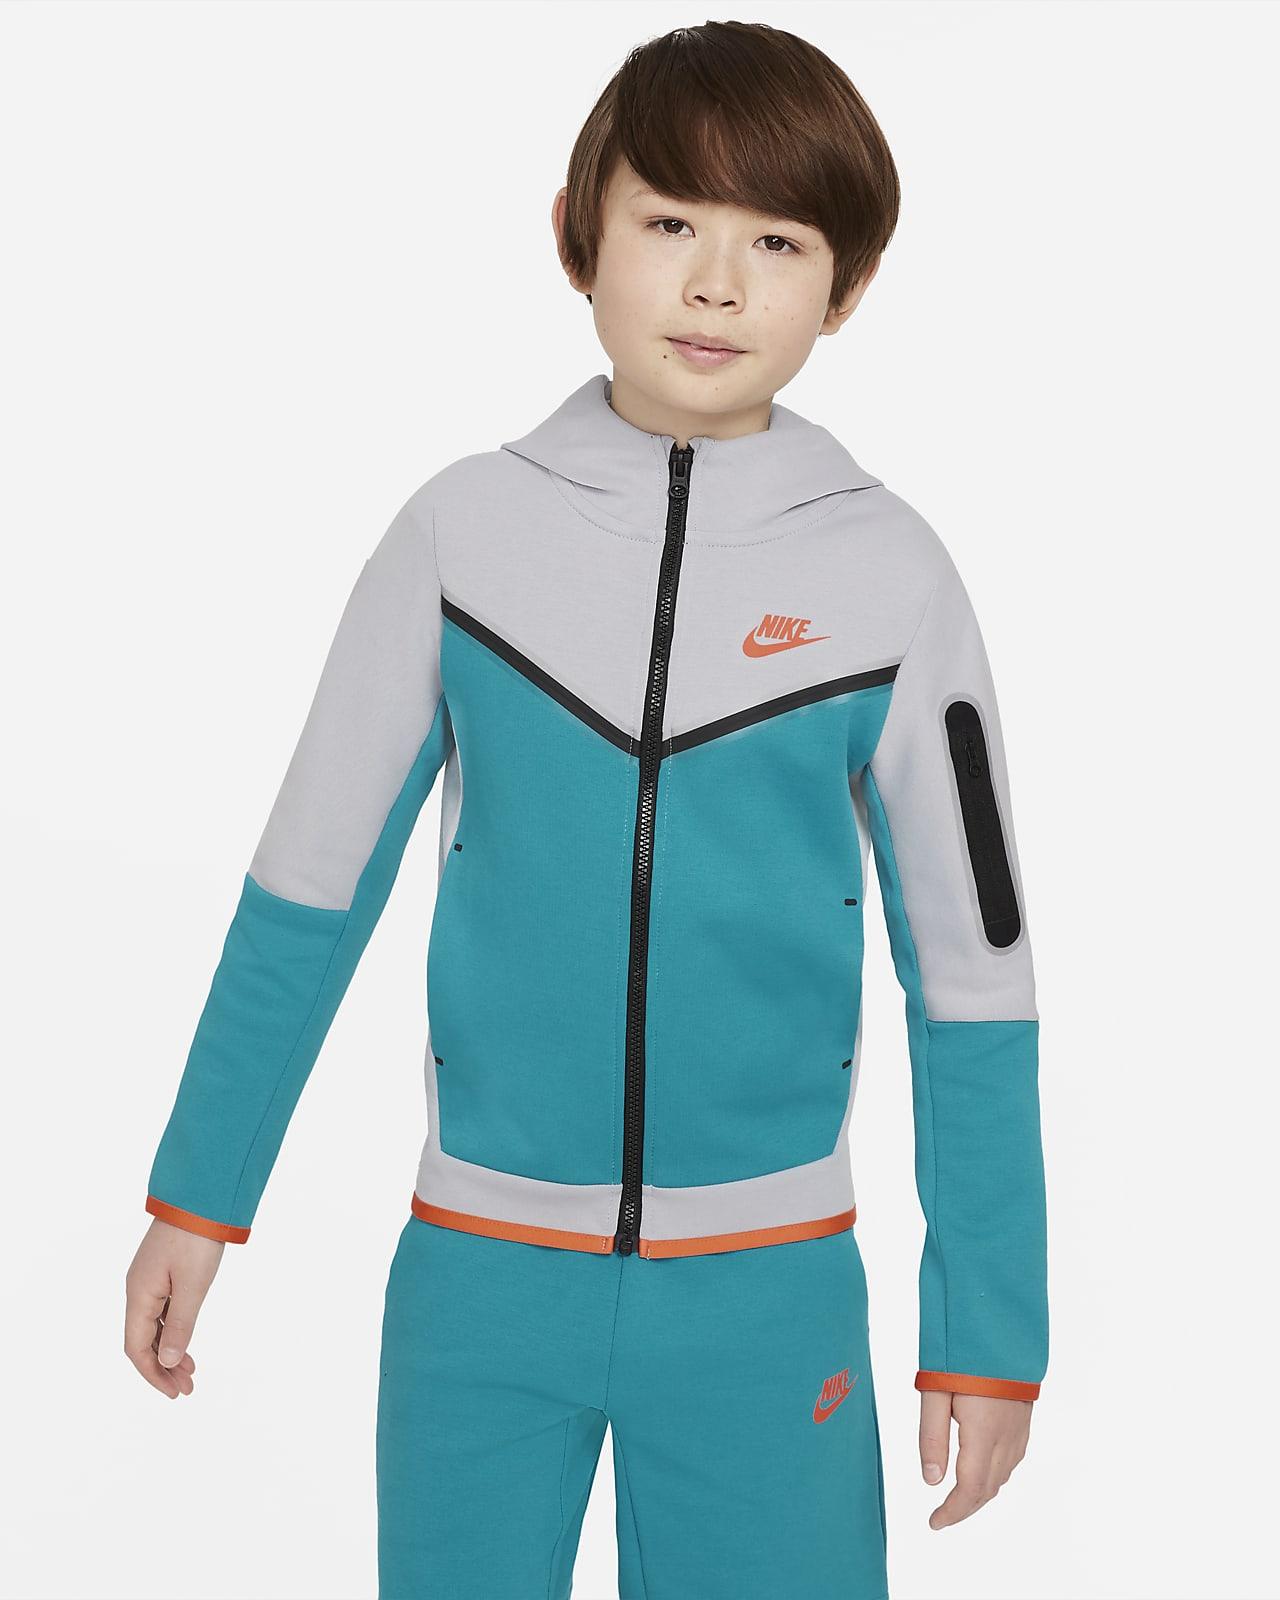 Nike Sportswear Tech Fleece Dessuadora amb caputxa i cremallera completa - Nen